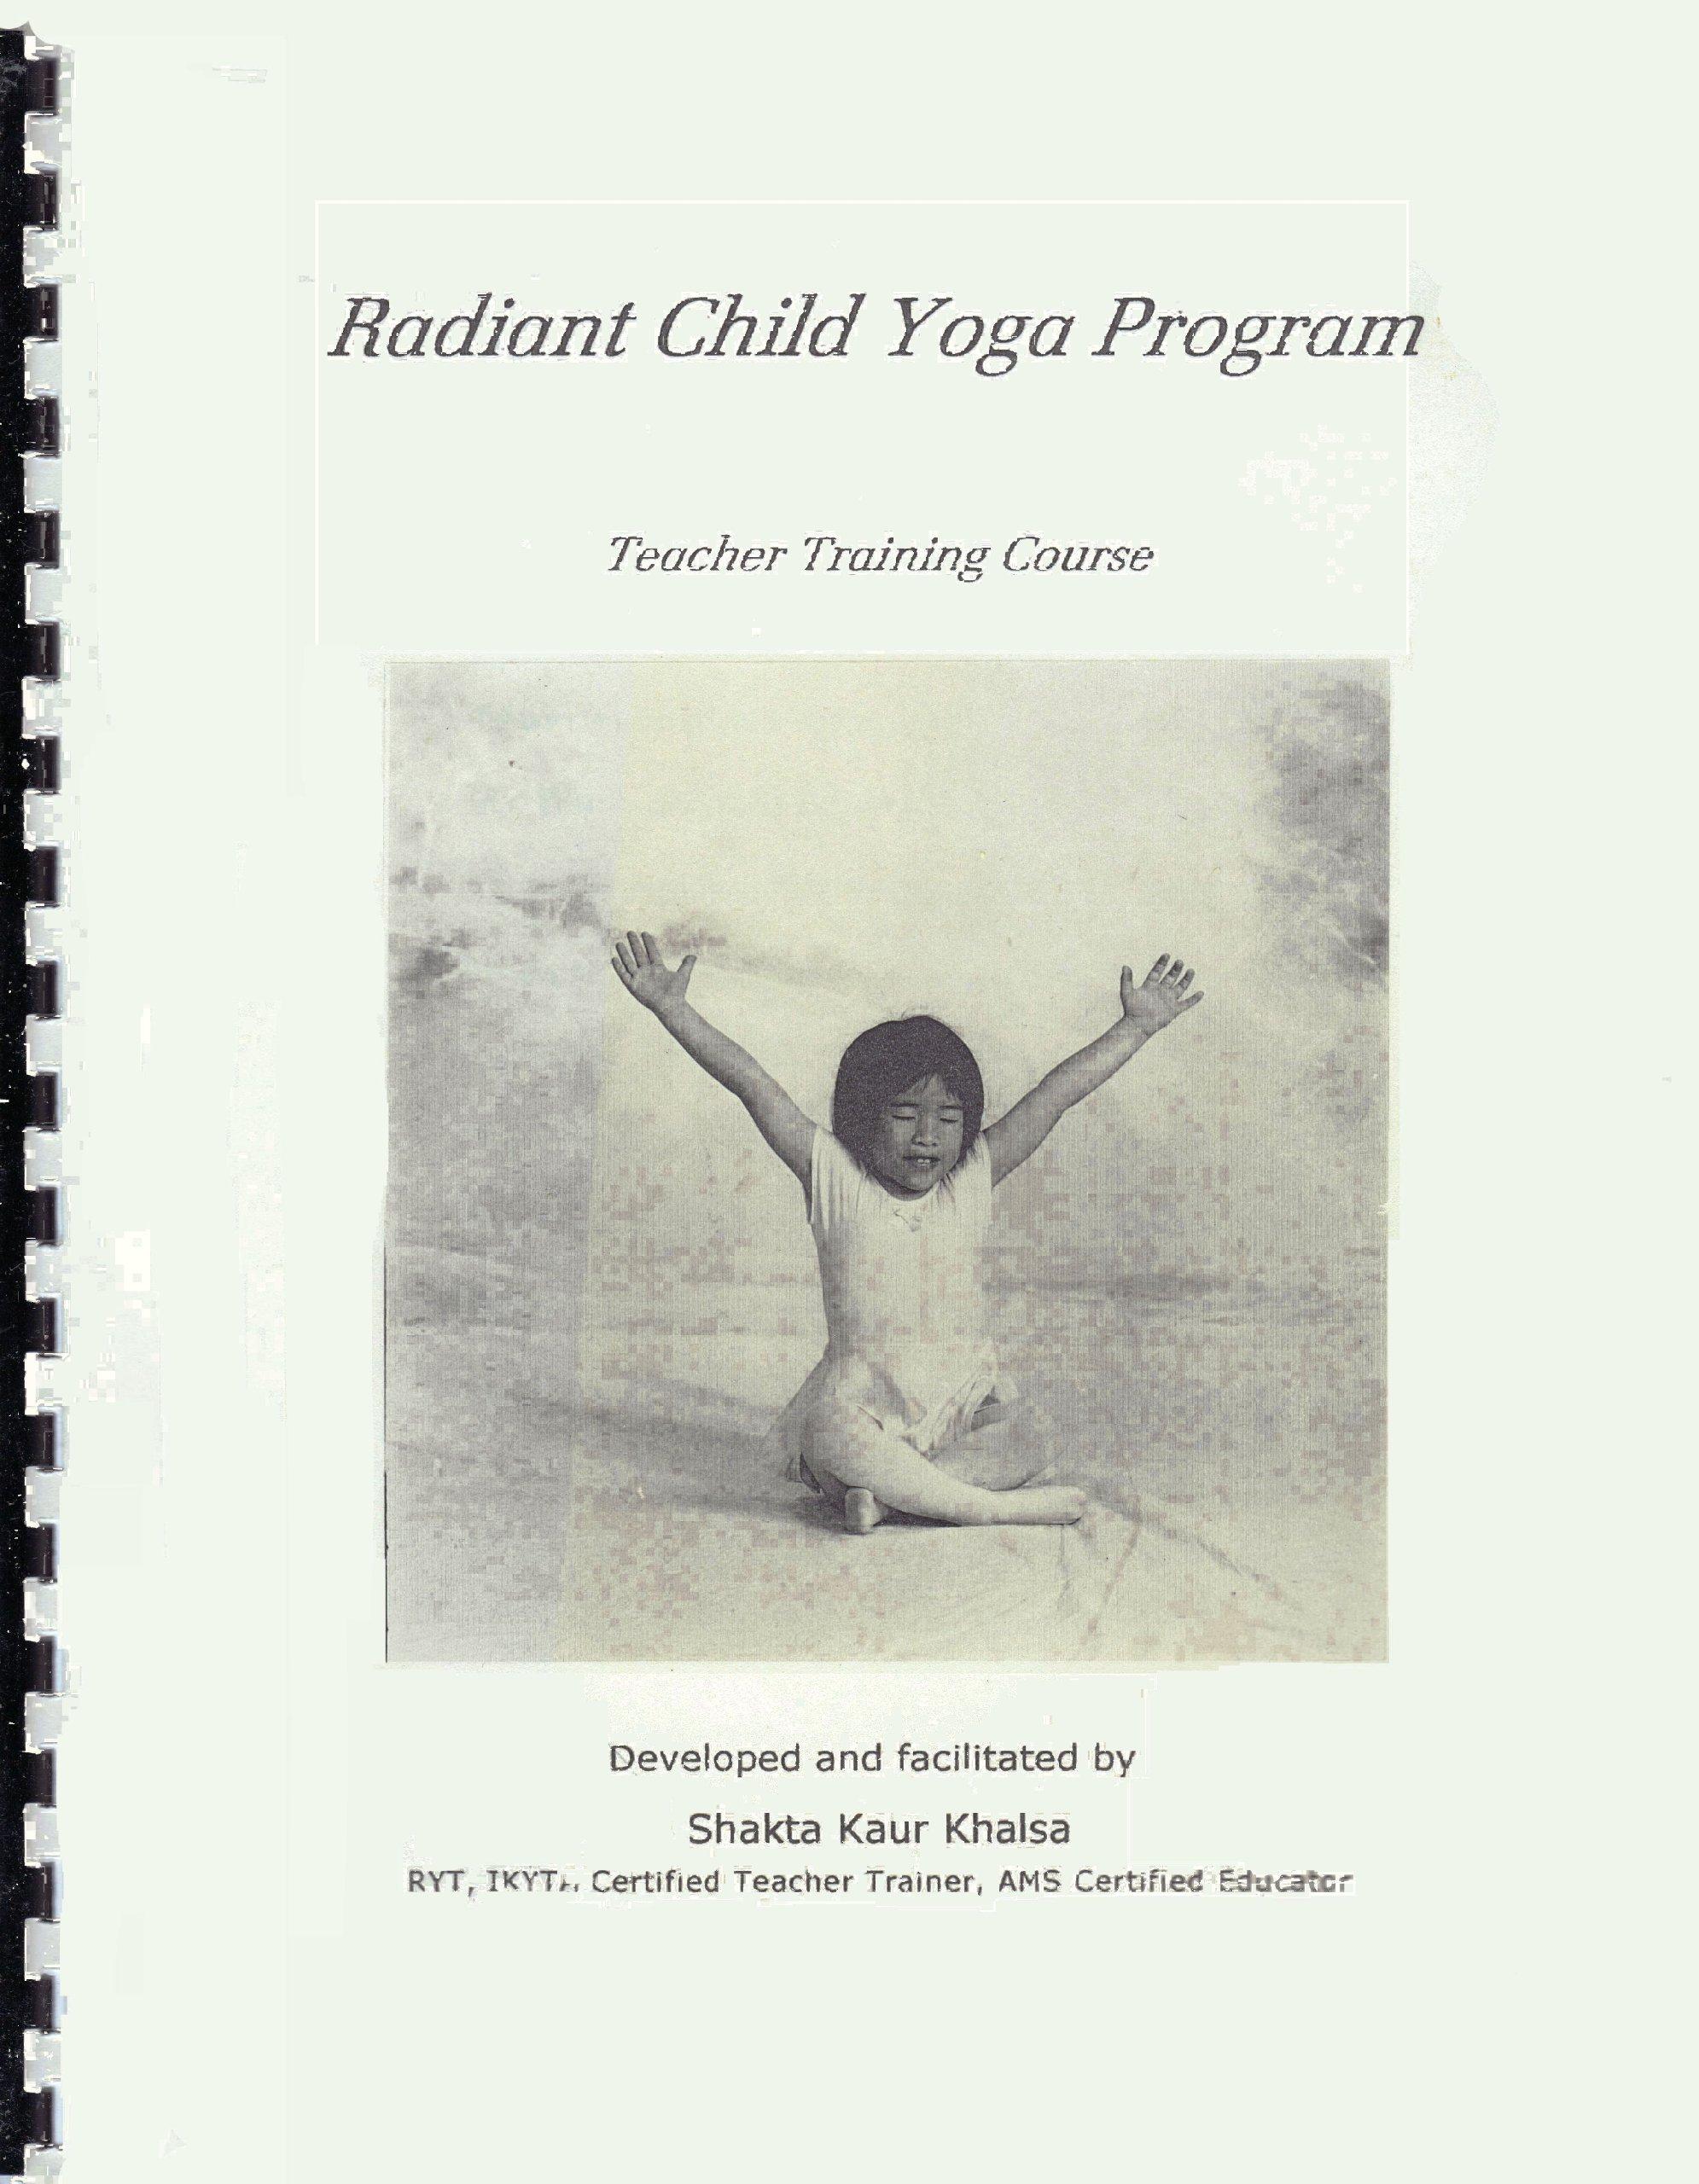 Radiant Child Yoga Program Teacher Training Course Outline ...